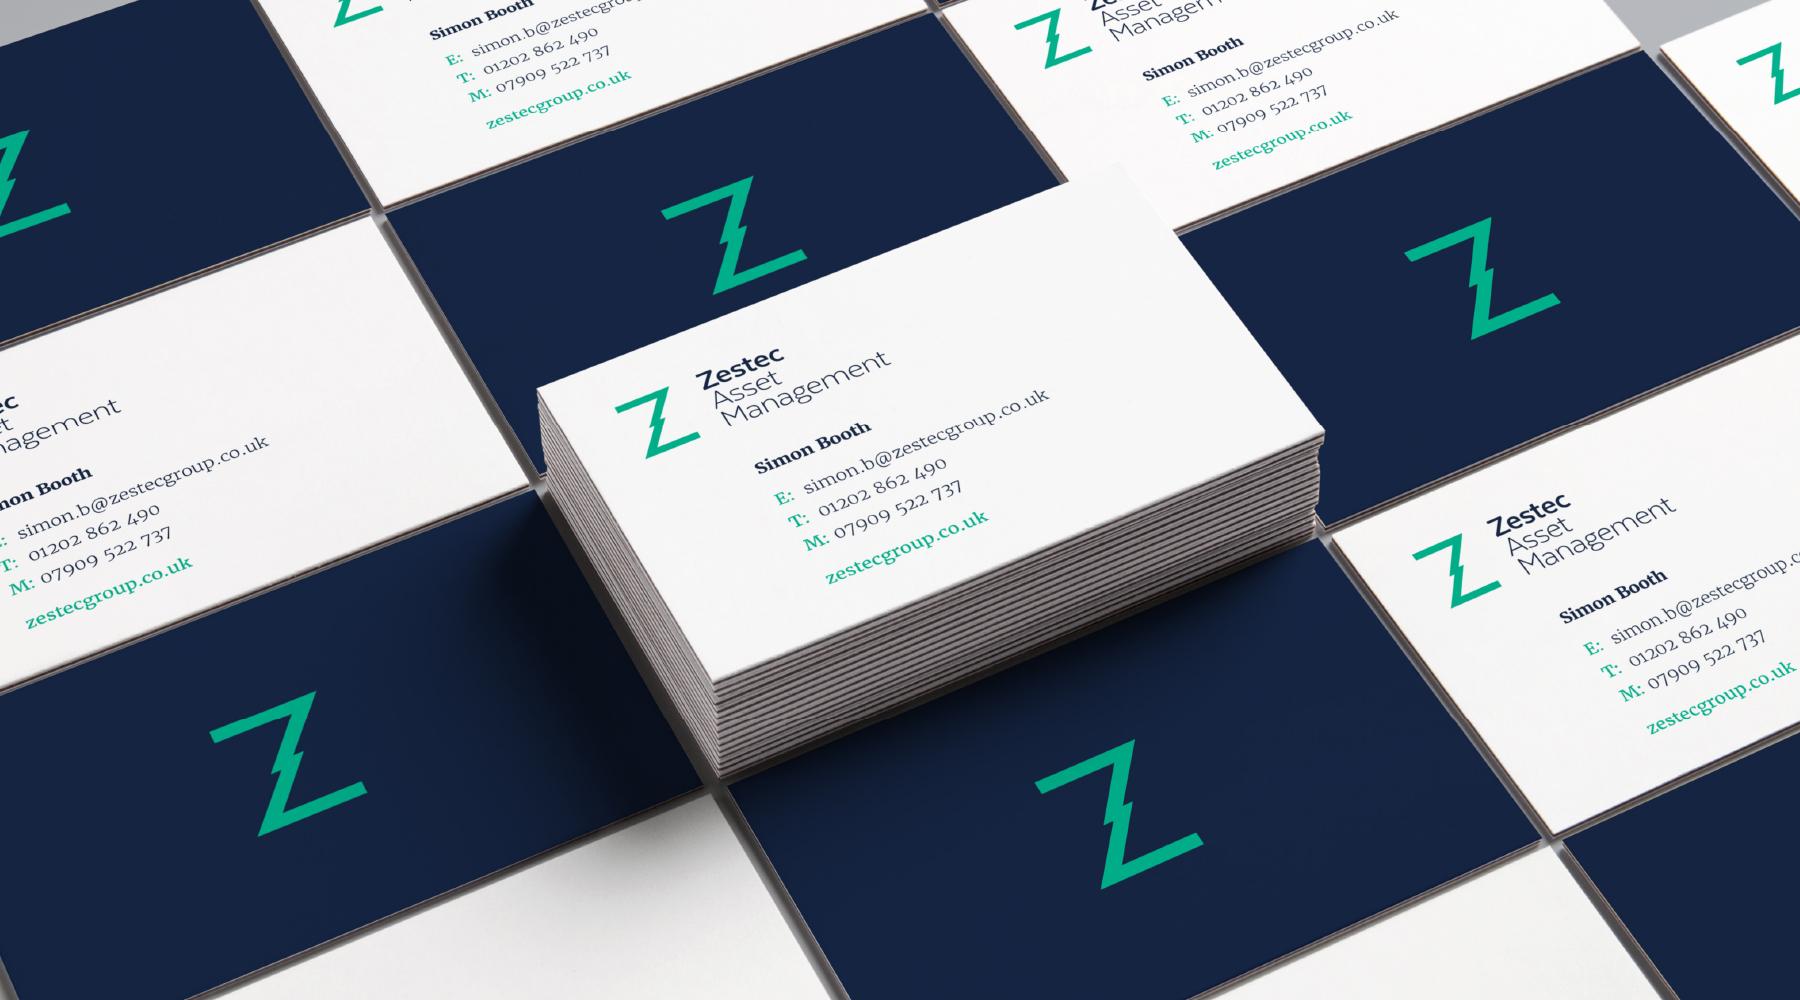 Zestec Business Card Graphic Design